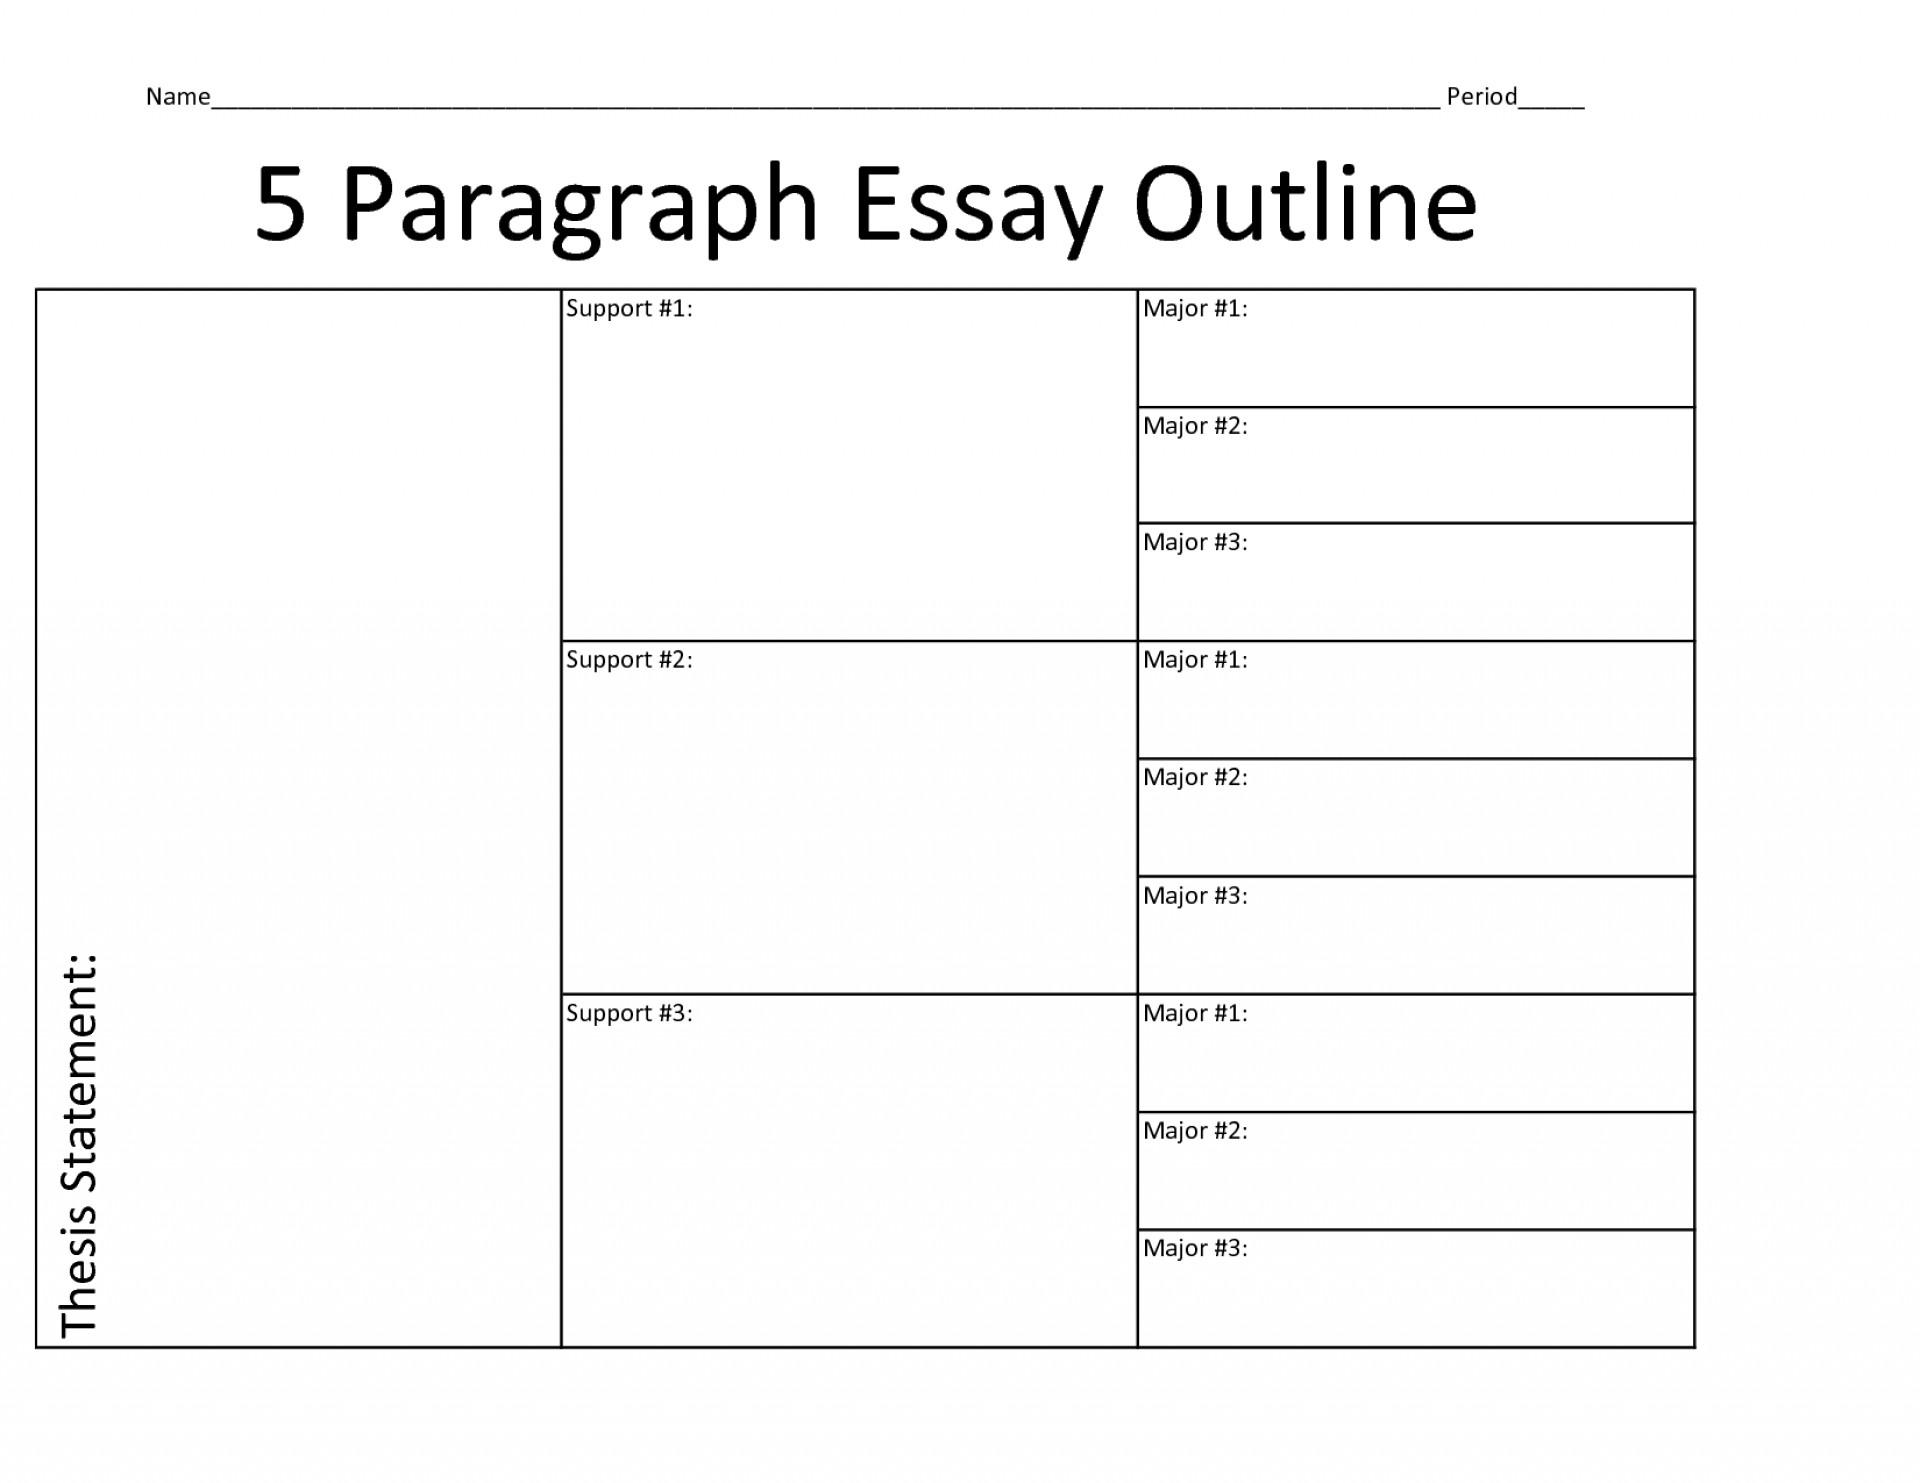 015 Five Paragraph Essay Graphic Organizer Organizers Executive Functioning Mr Brown039s Outline L Wonderful 5 Middle School Pdf Organizer-hamburger 1920